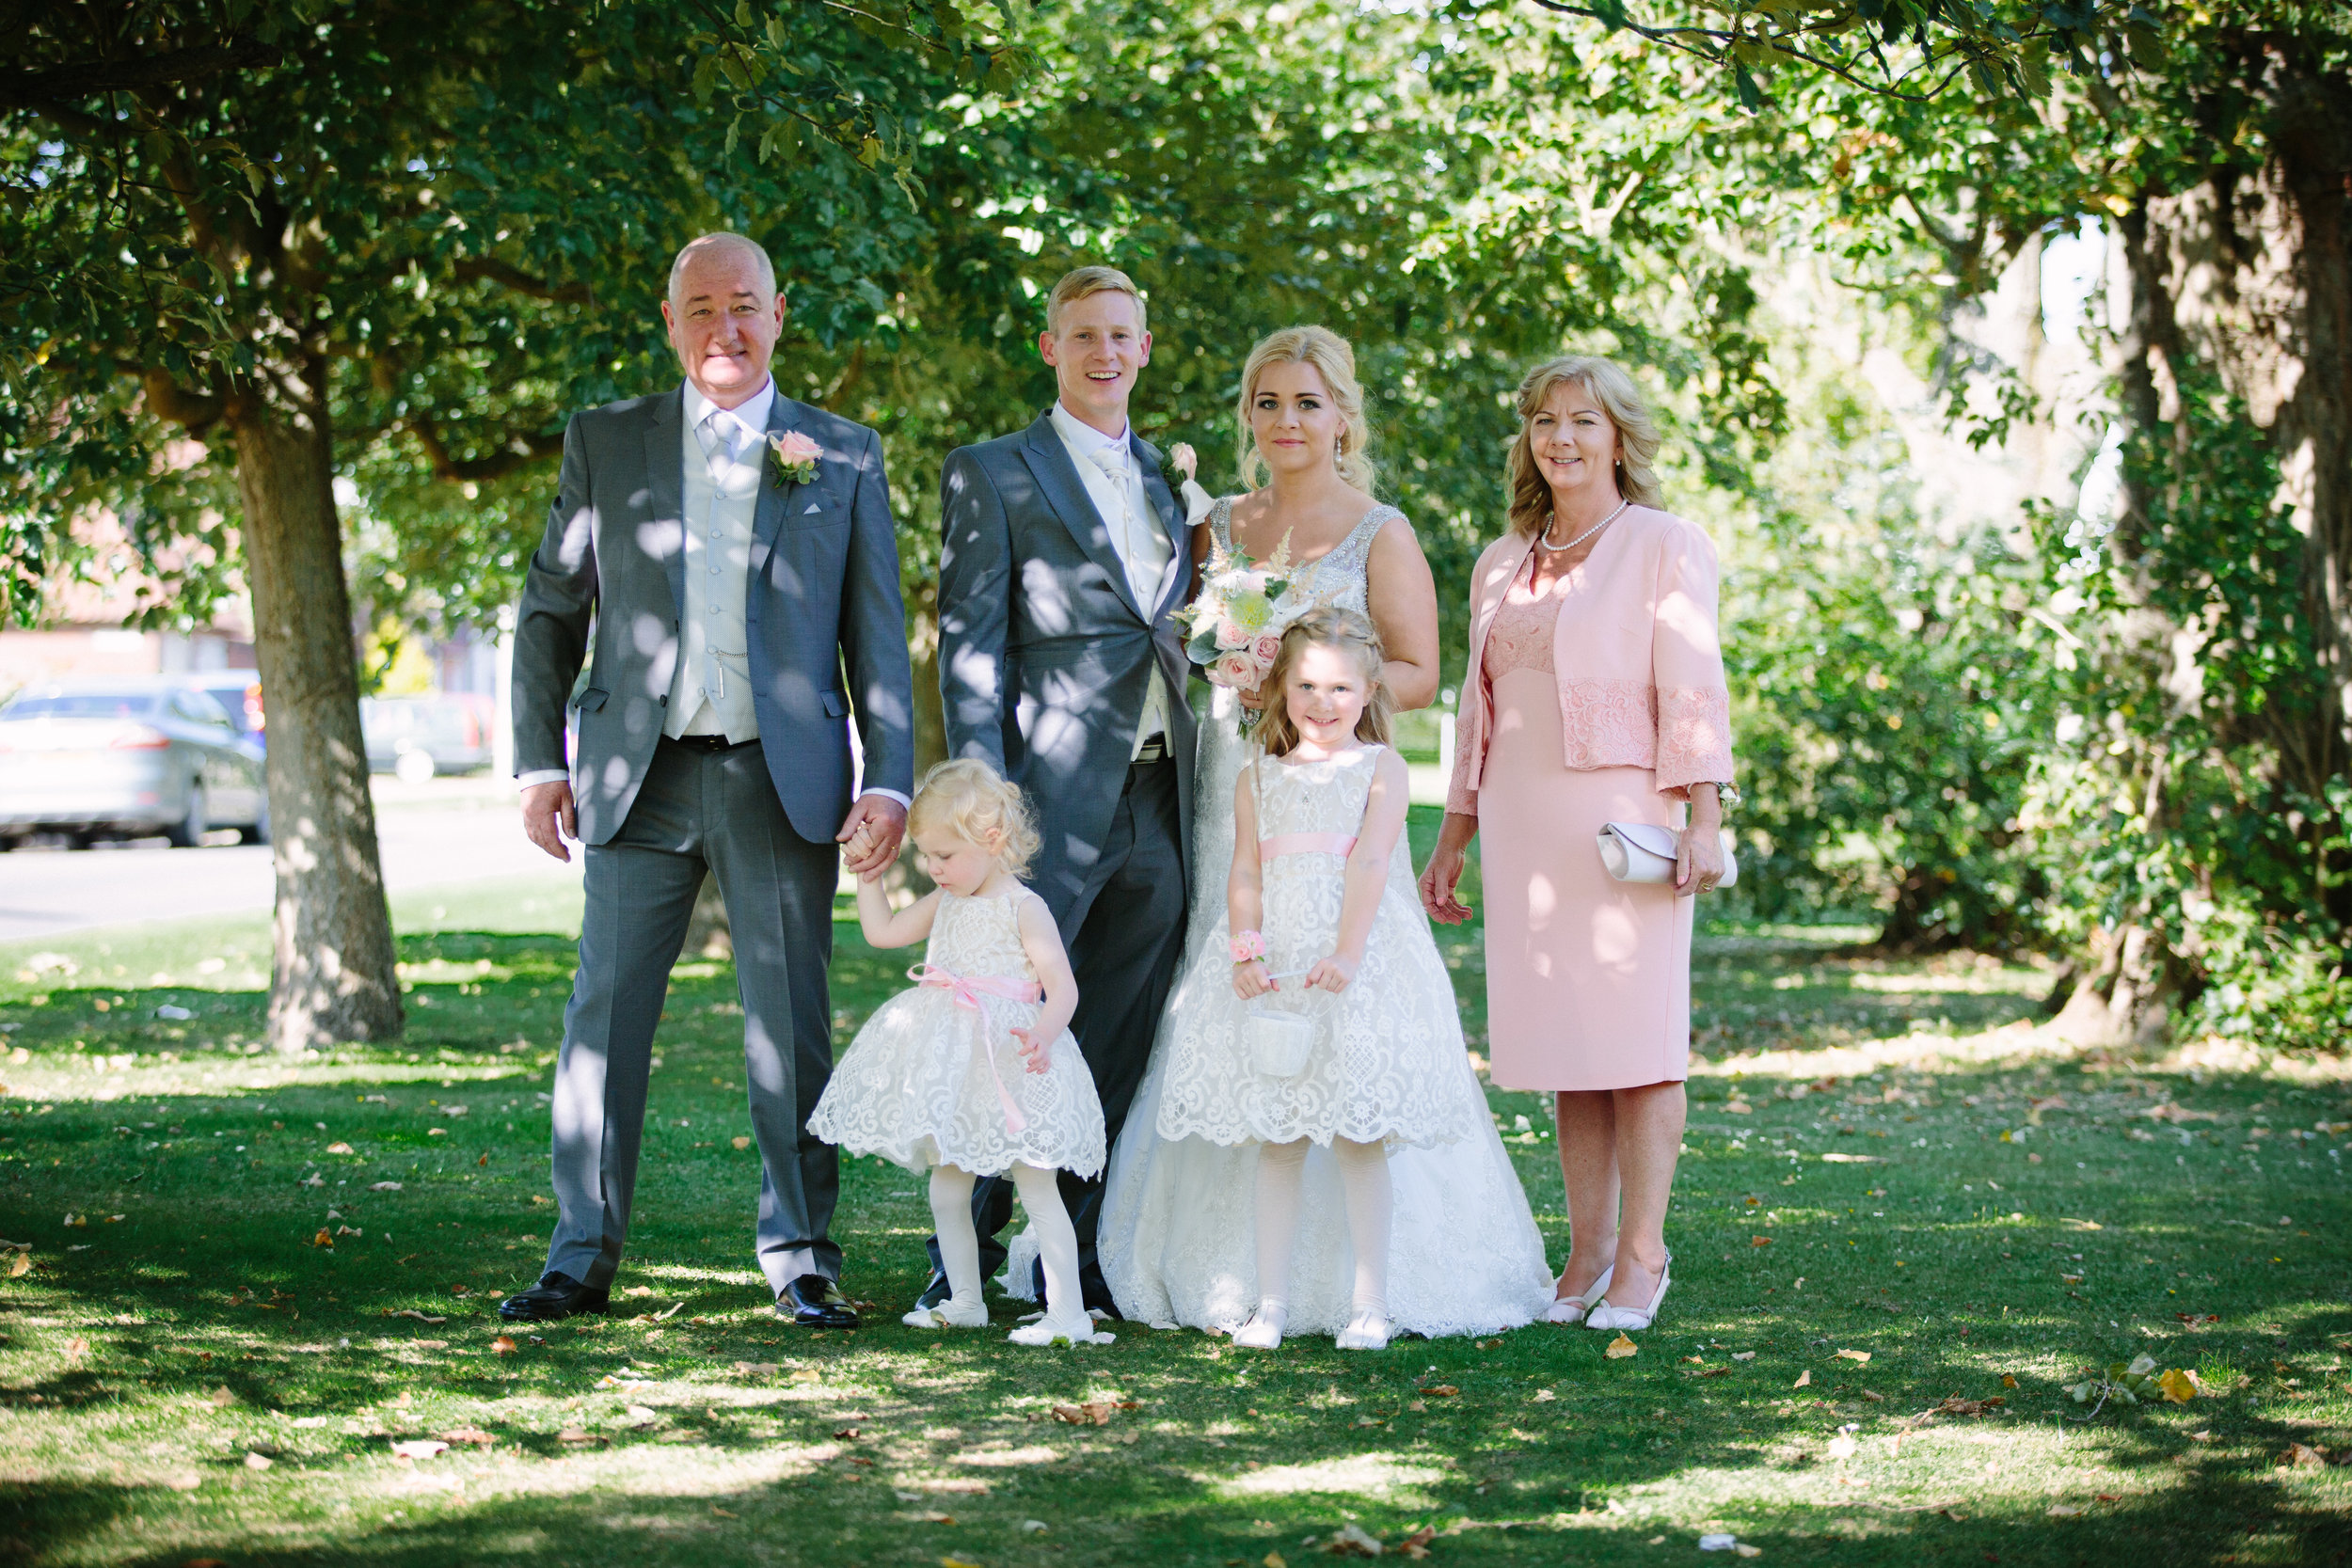 hitchin-hertfordshire-london-wedding-photography-catholic-church-group-formal-40